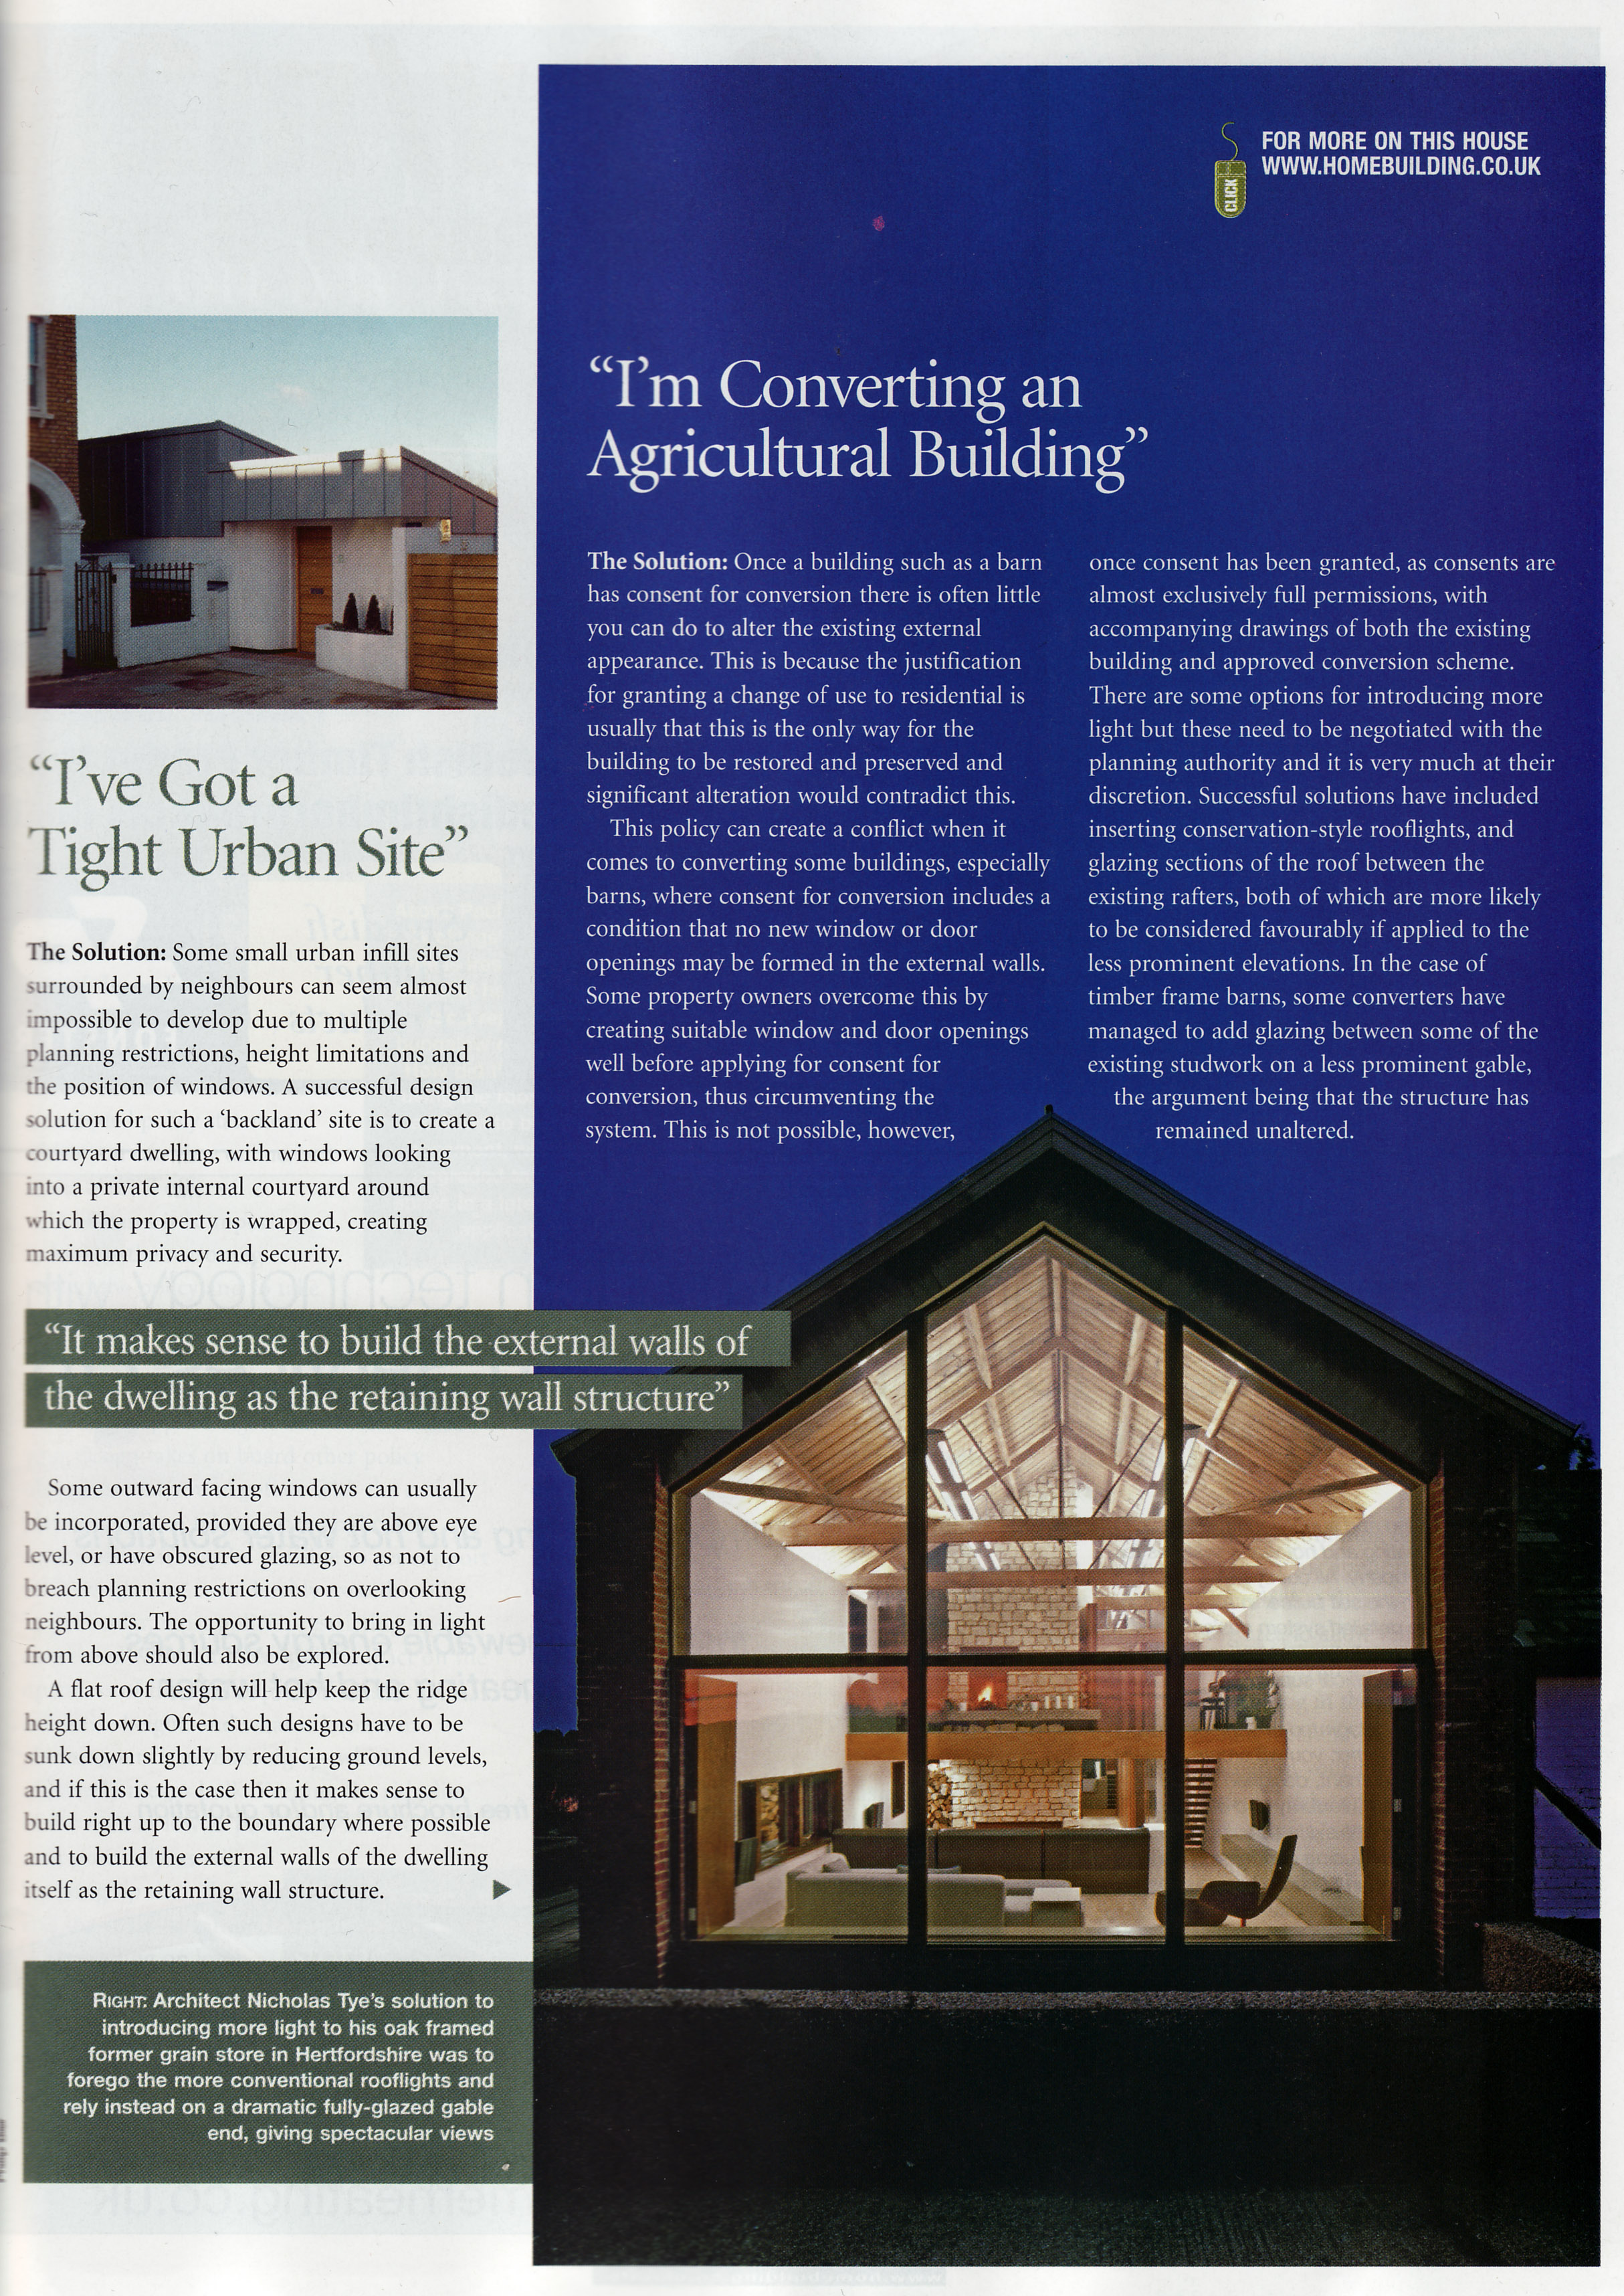 nicolas tye architects architectural design publications london. Black Bedroom Furniture Sets. Home Design Ideas